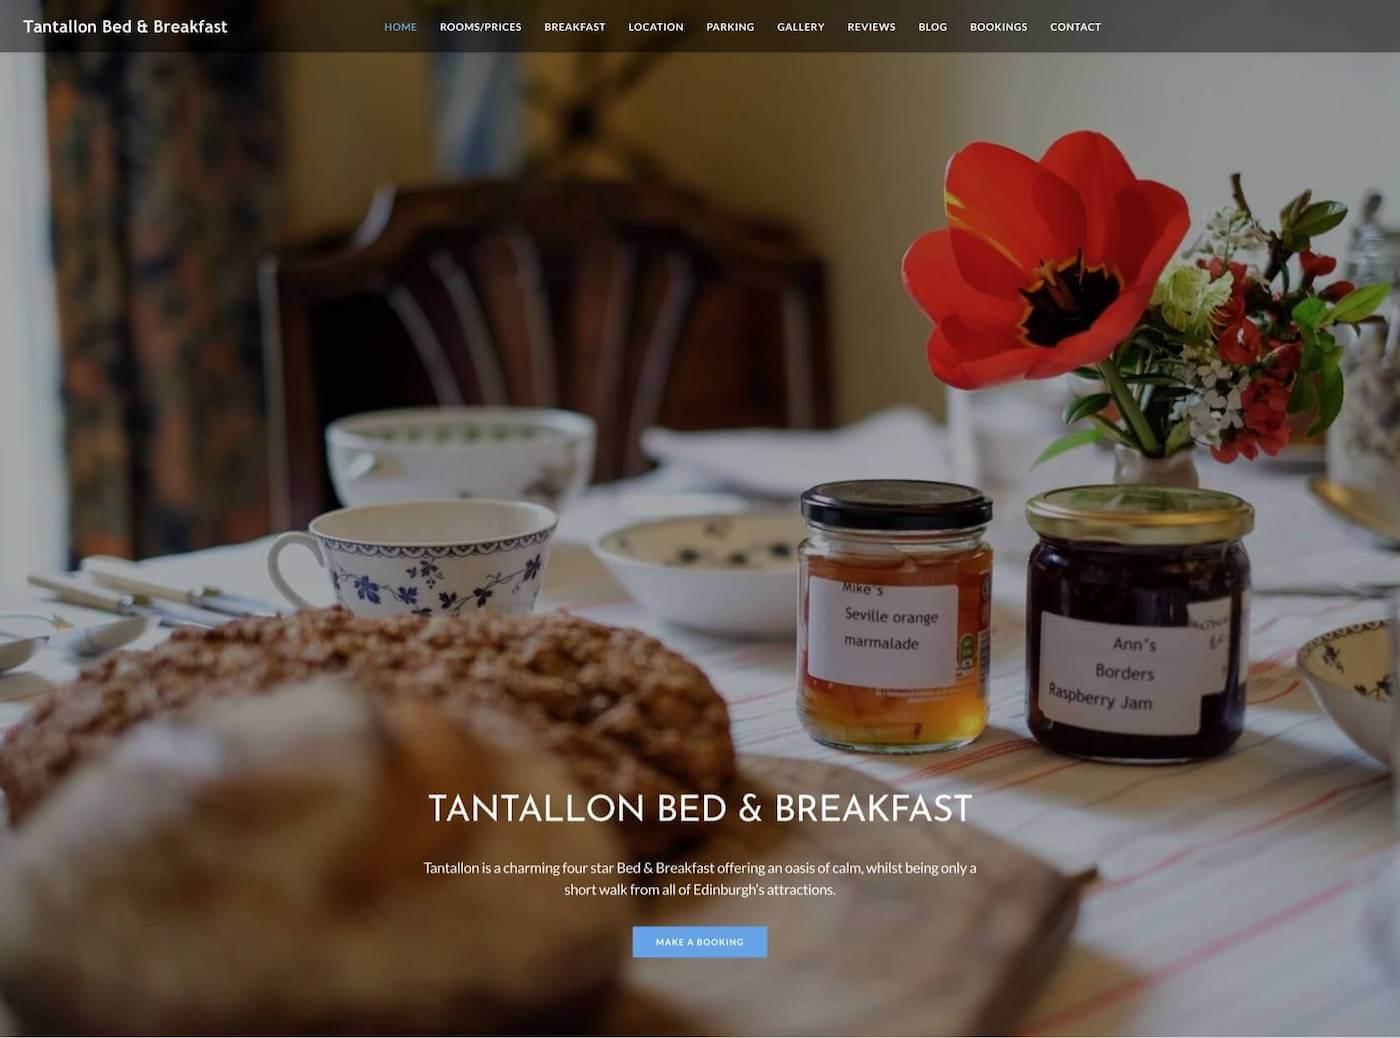 Web design for Tantallon Place B&B, Edinburgh